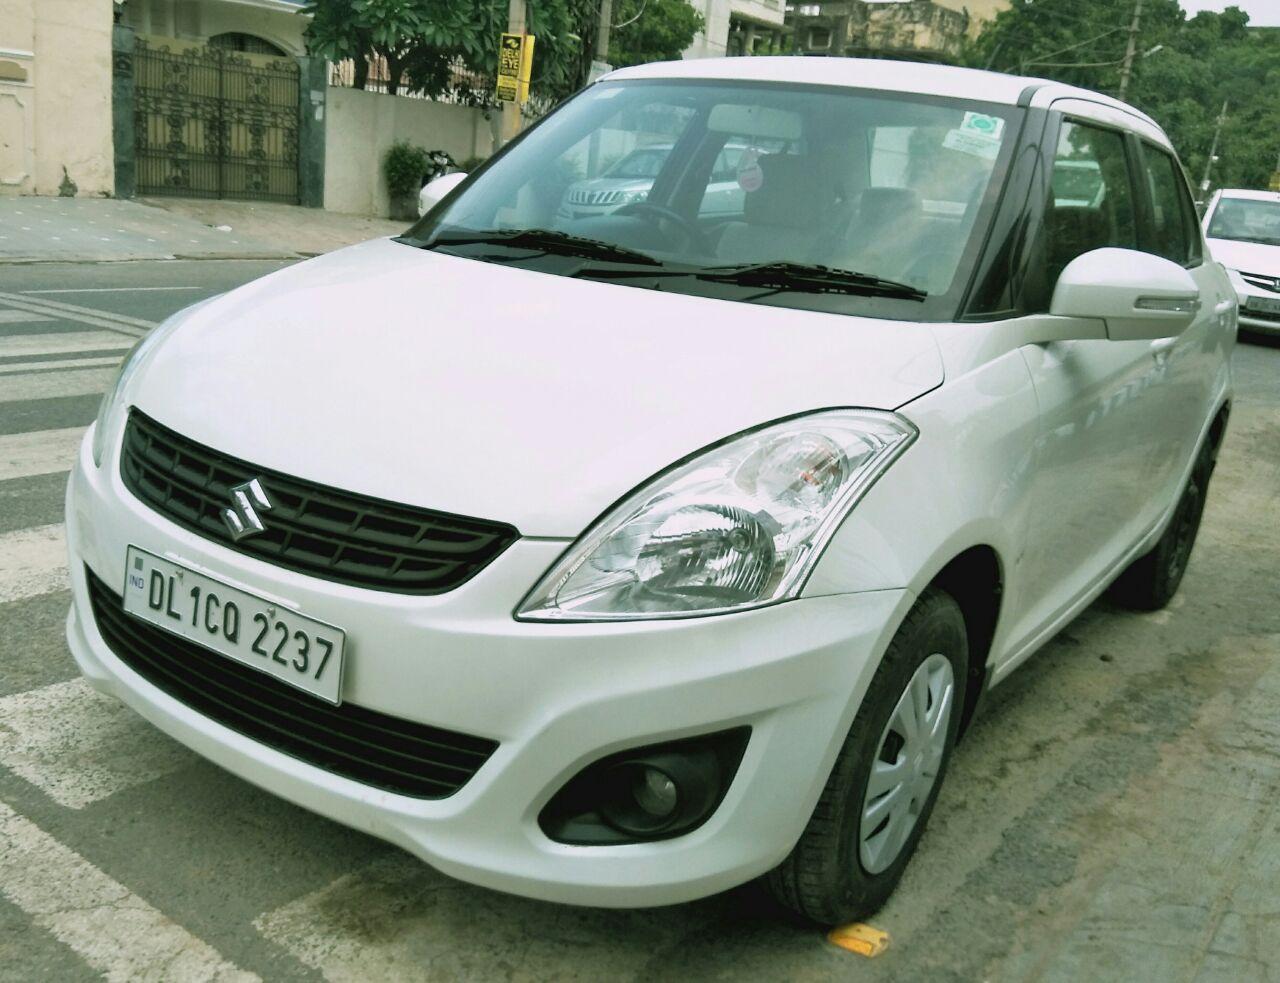 Used Swift Dzire-Vxi Maruti in Delhi